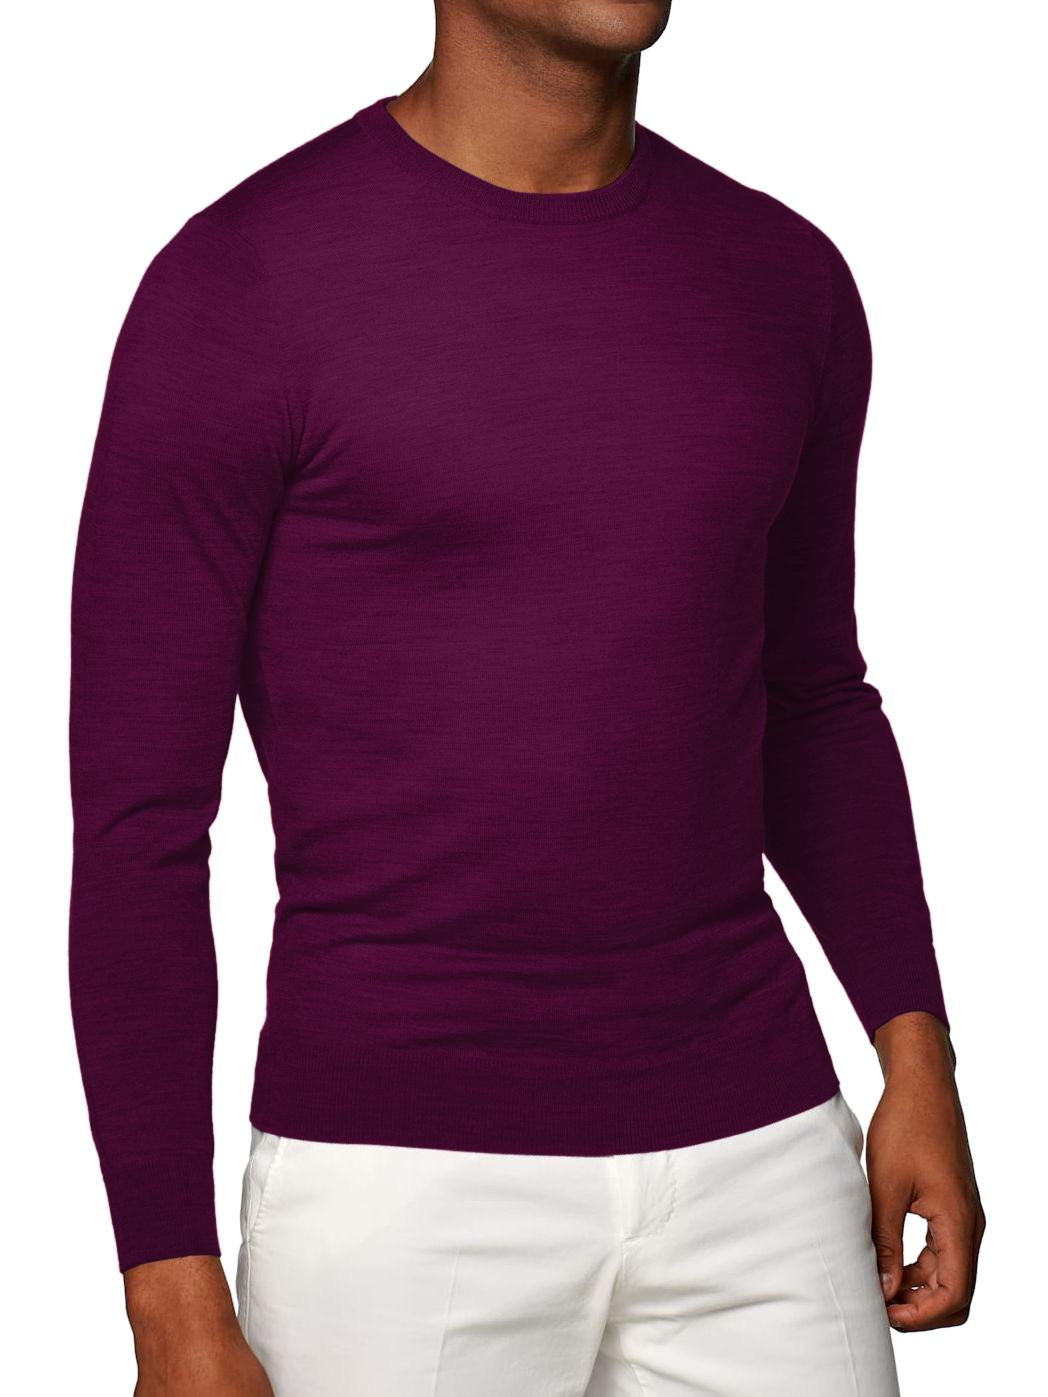 Light Purple Merino Wool Crew Neck Sweater